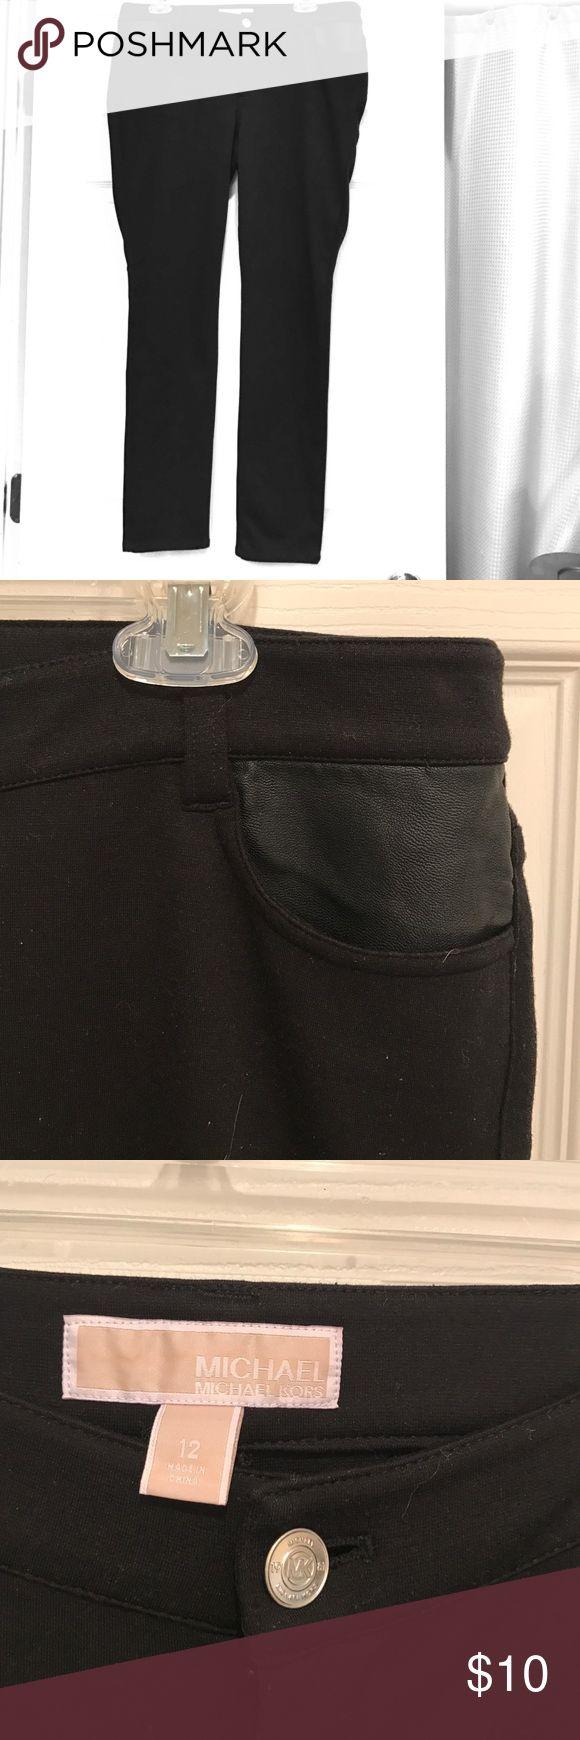 Black Michael Kors Leggings This is a cute pair of black Michael Kors leggings with leather pockets. Used, but in good condition ! Michael Kors Pants Leggings